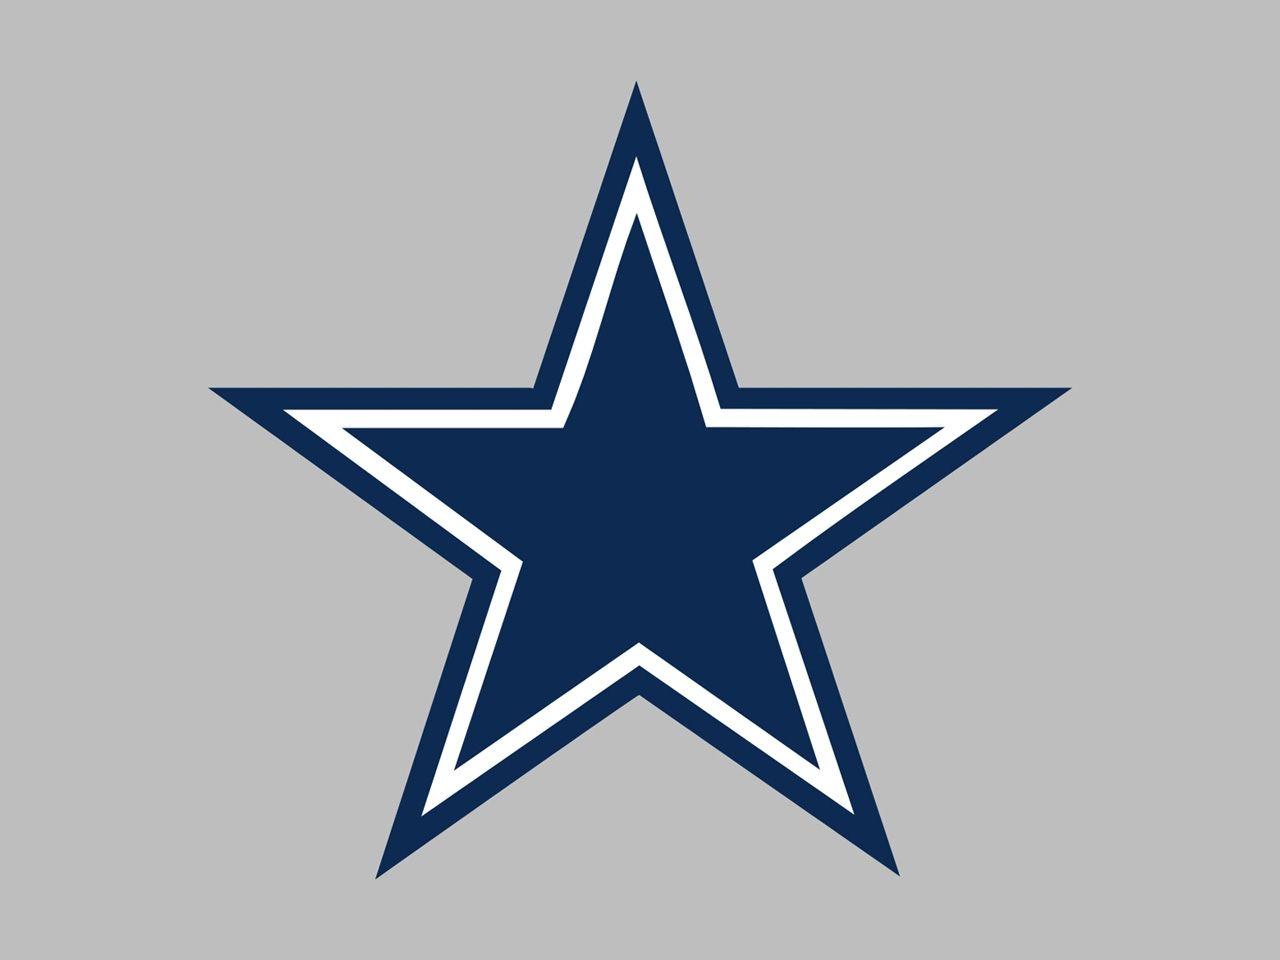 1280x960 Pictures Clip Art Dallas Cowboys Logo